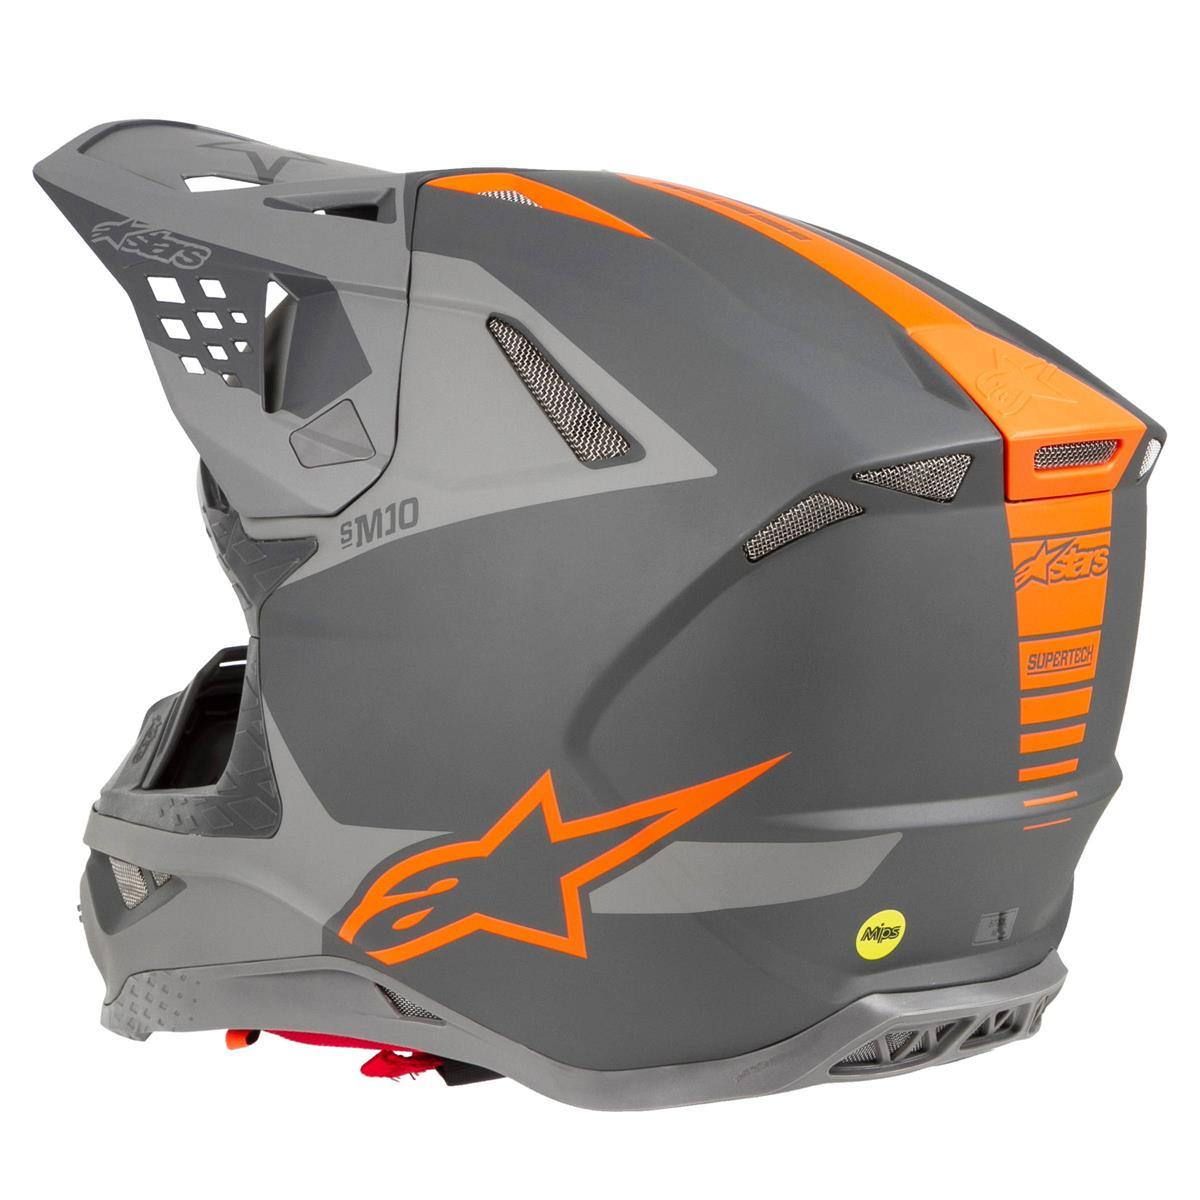 alpinestars-helm-helmet-supertech-s-m10-5